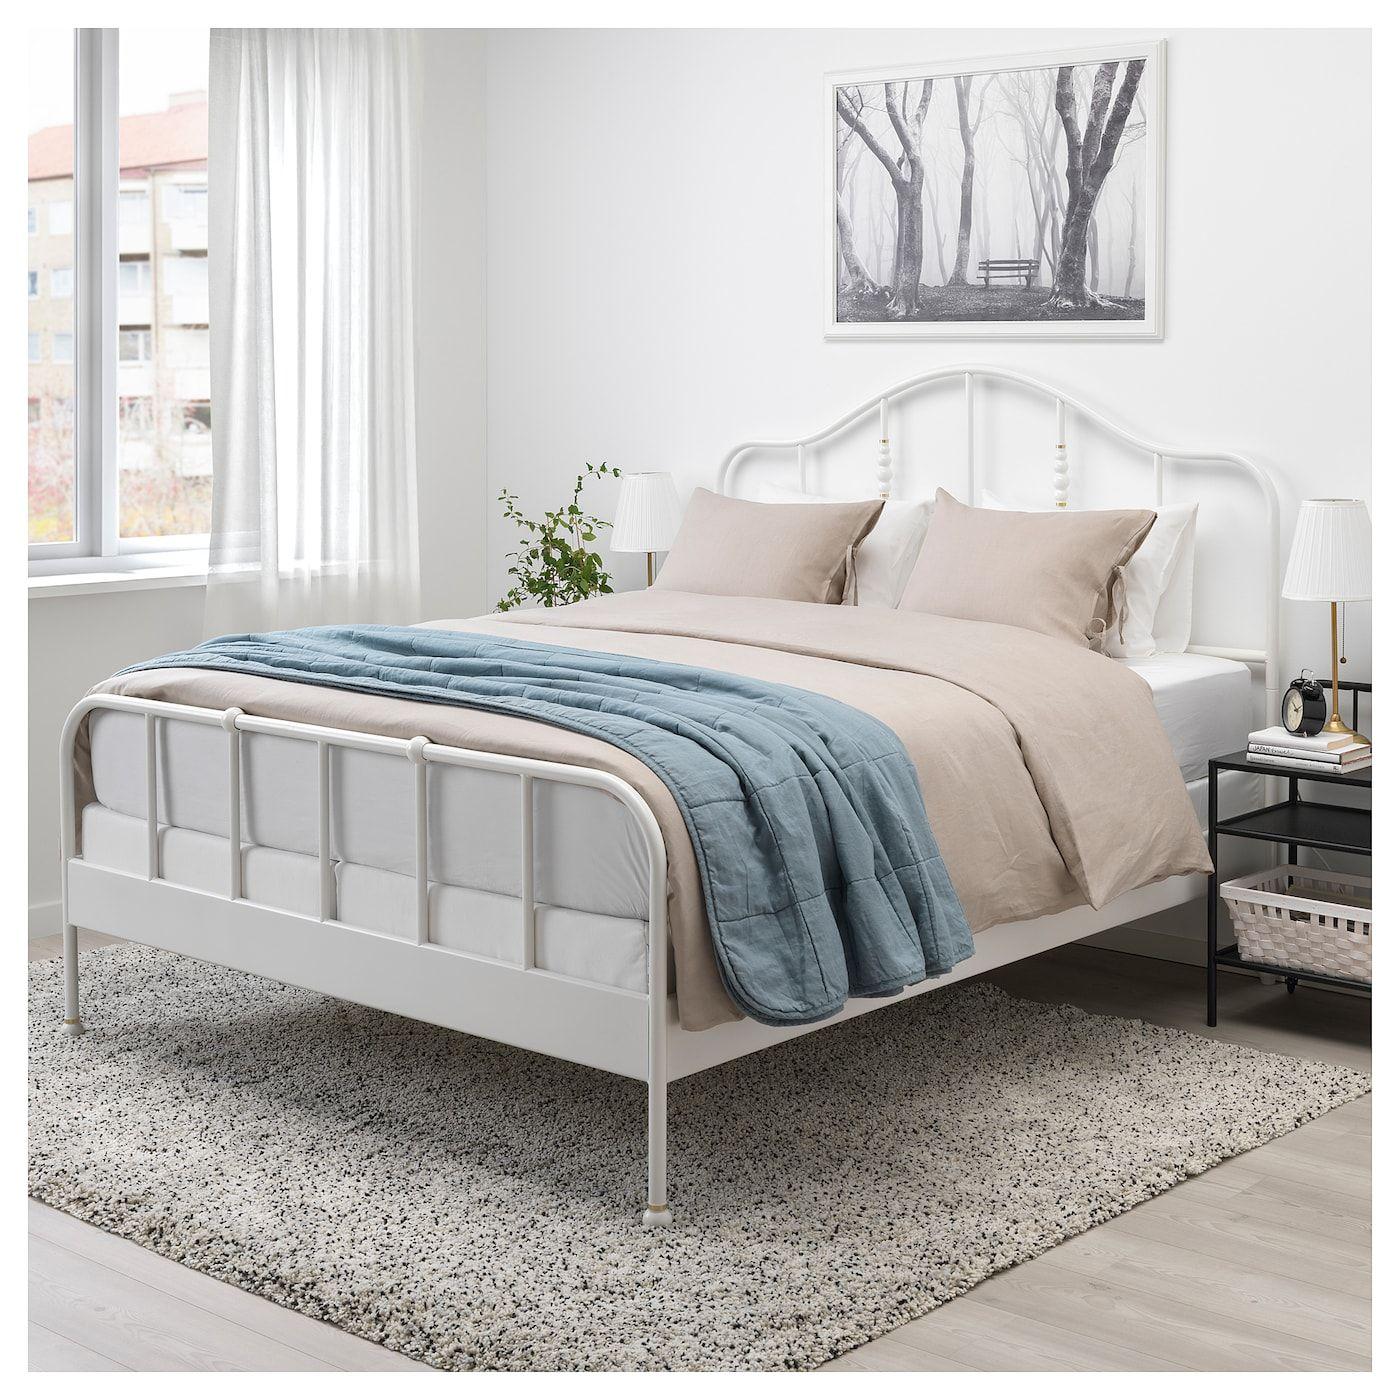 SAGSTUA Bed frame white, Espevär Queen (с изображениями